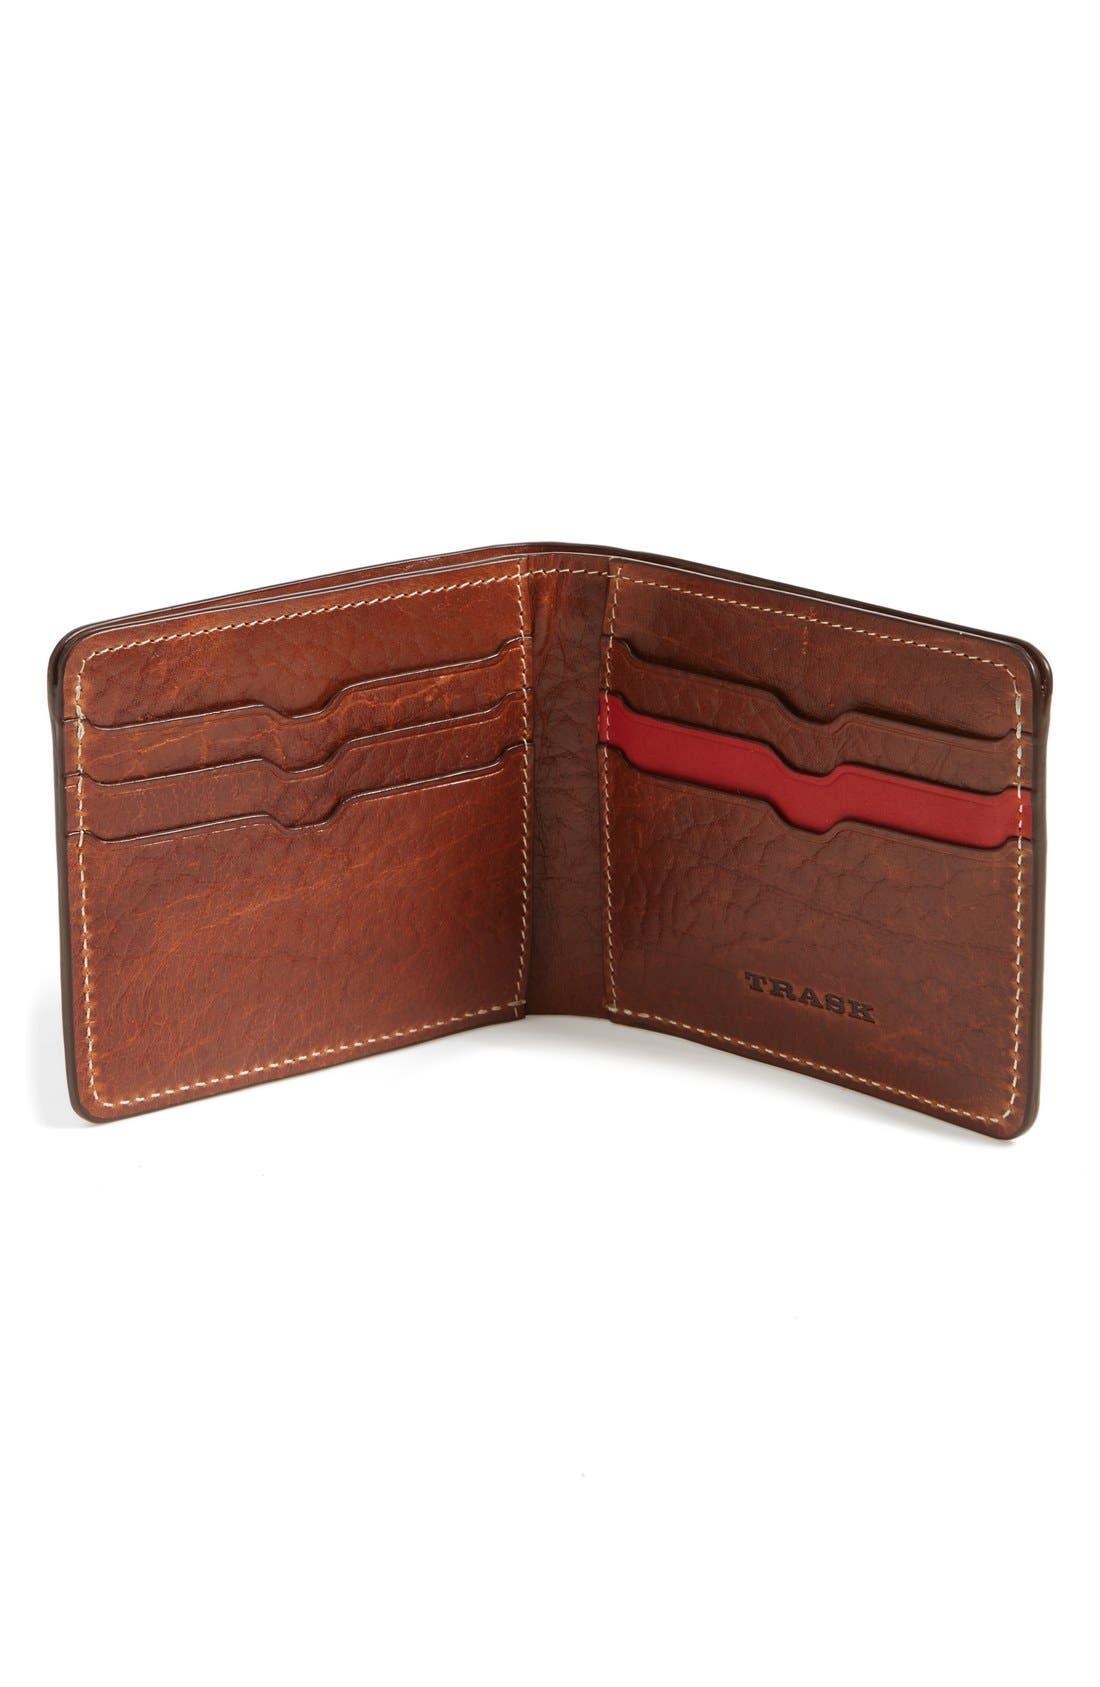 'Jackson' Bison Leather Wallet,                             Alternate thumbnail 2, color,                             700